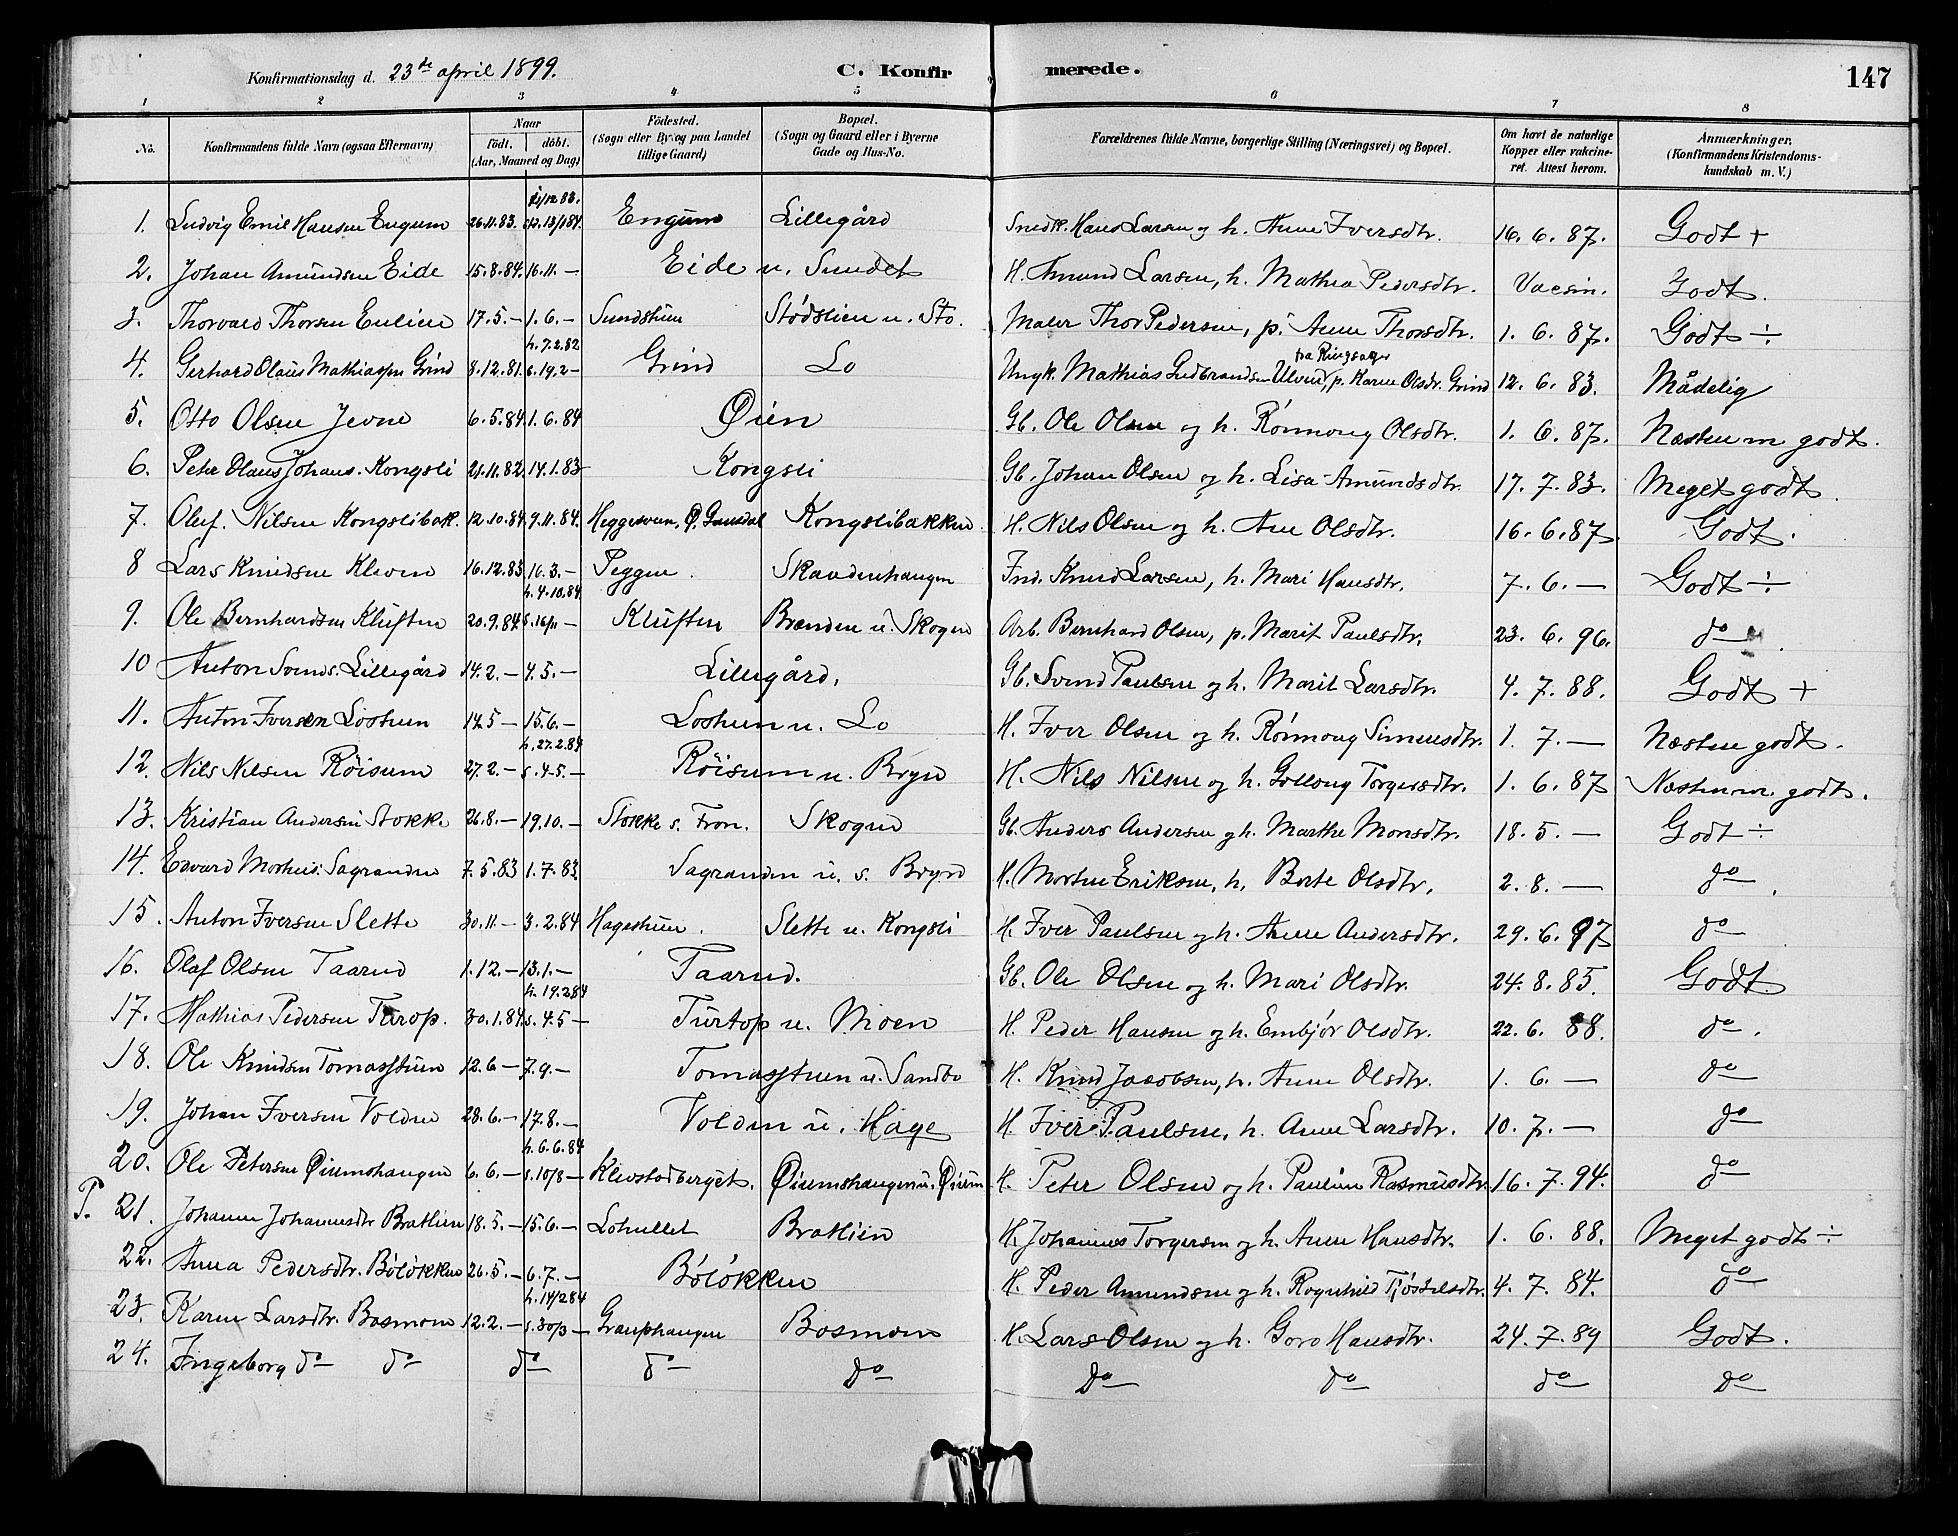 SAH, Nord-Fron prestekontor, Klokkerbok nr. 4, 1884-1914, s. 147